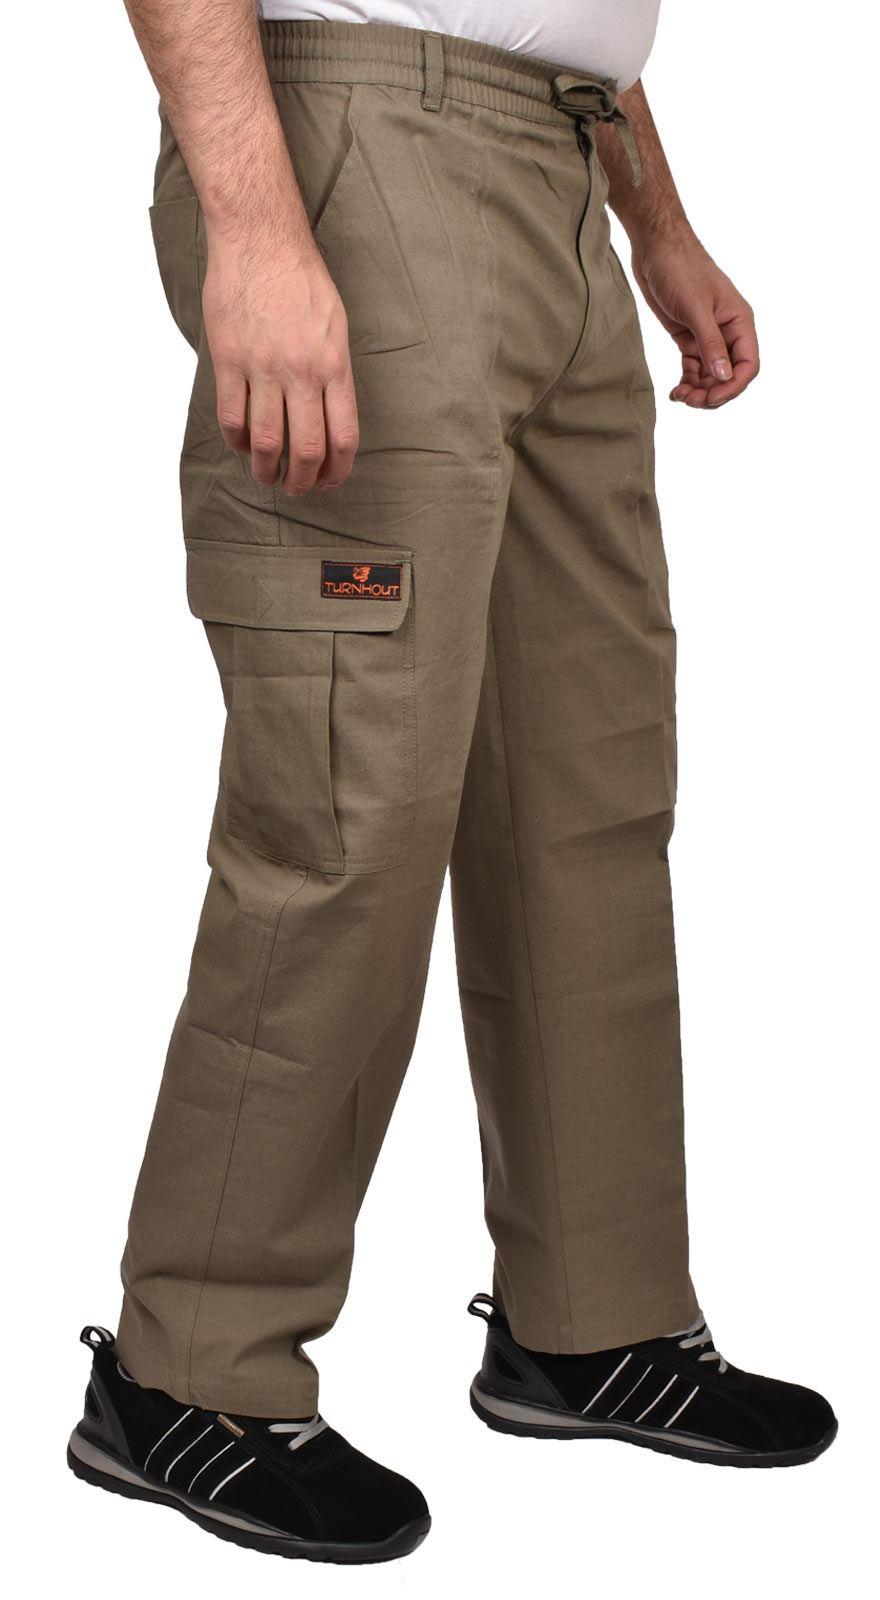 Para-Hombre-De-Carga-Combate-Pantalones-De-Trabajo-Bolsillos-Patrulla-Tactico-Pro-Algodon-Pantalones miniatura 16